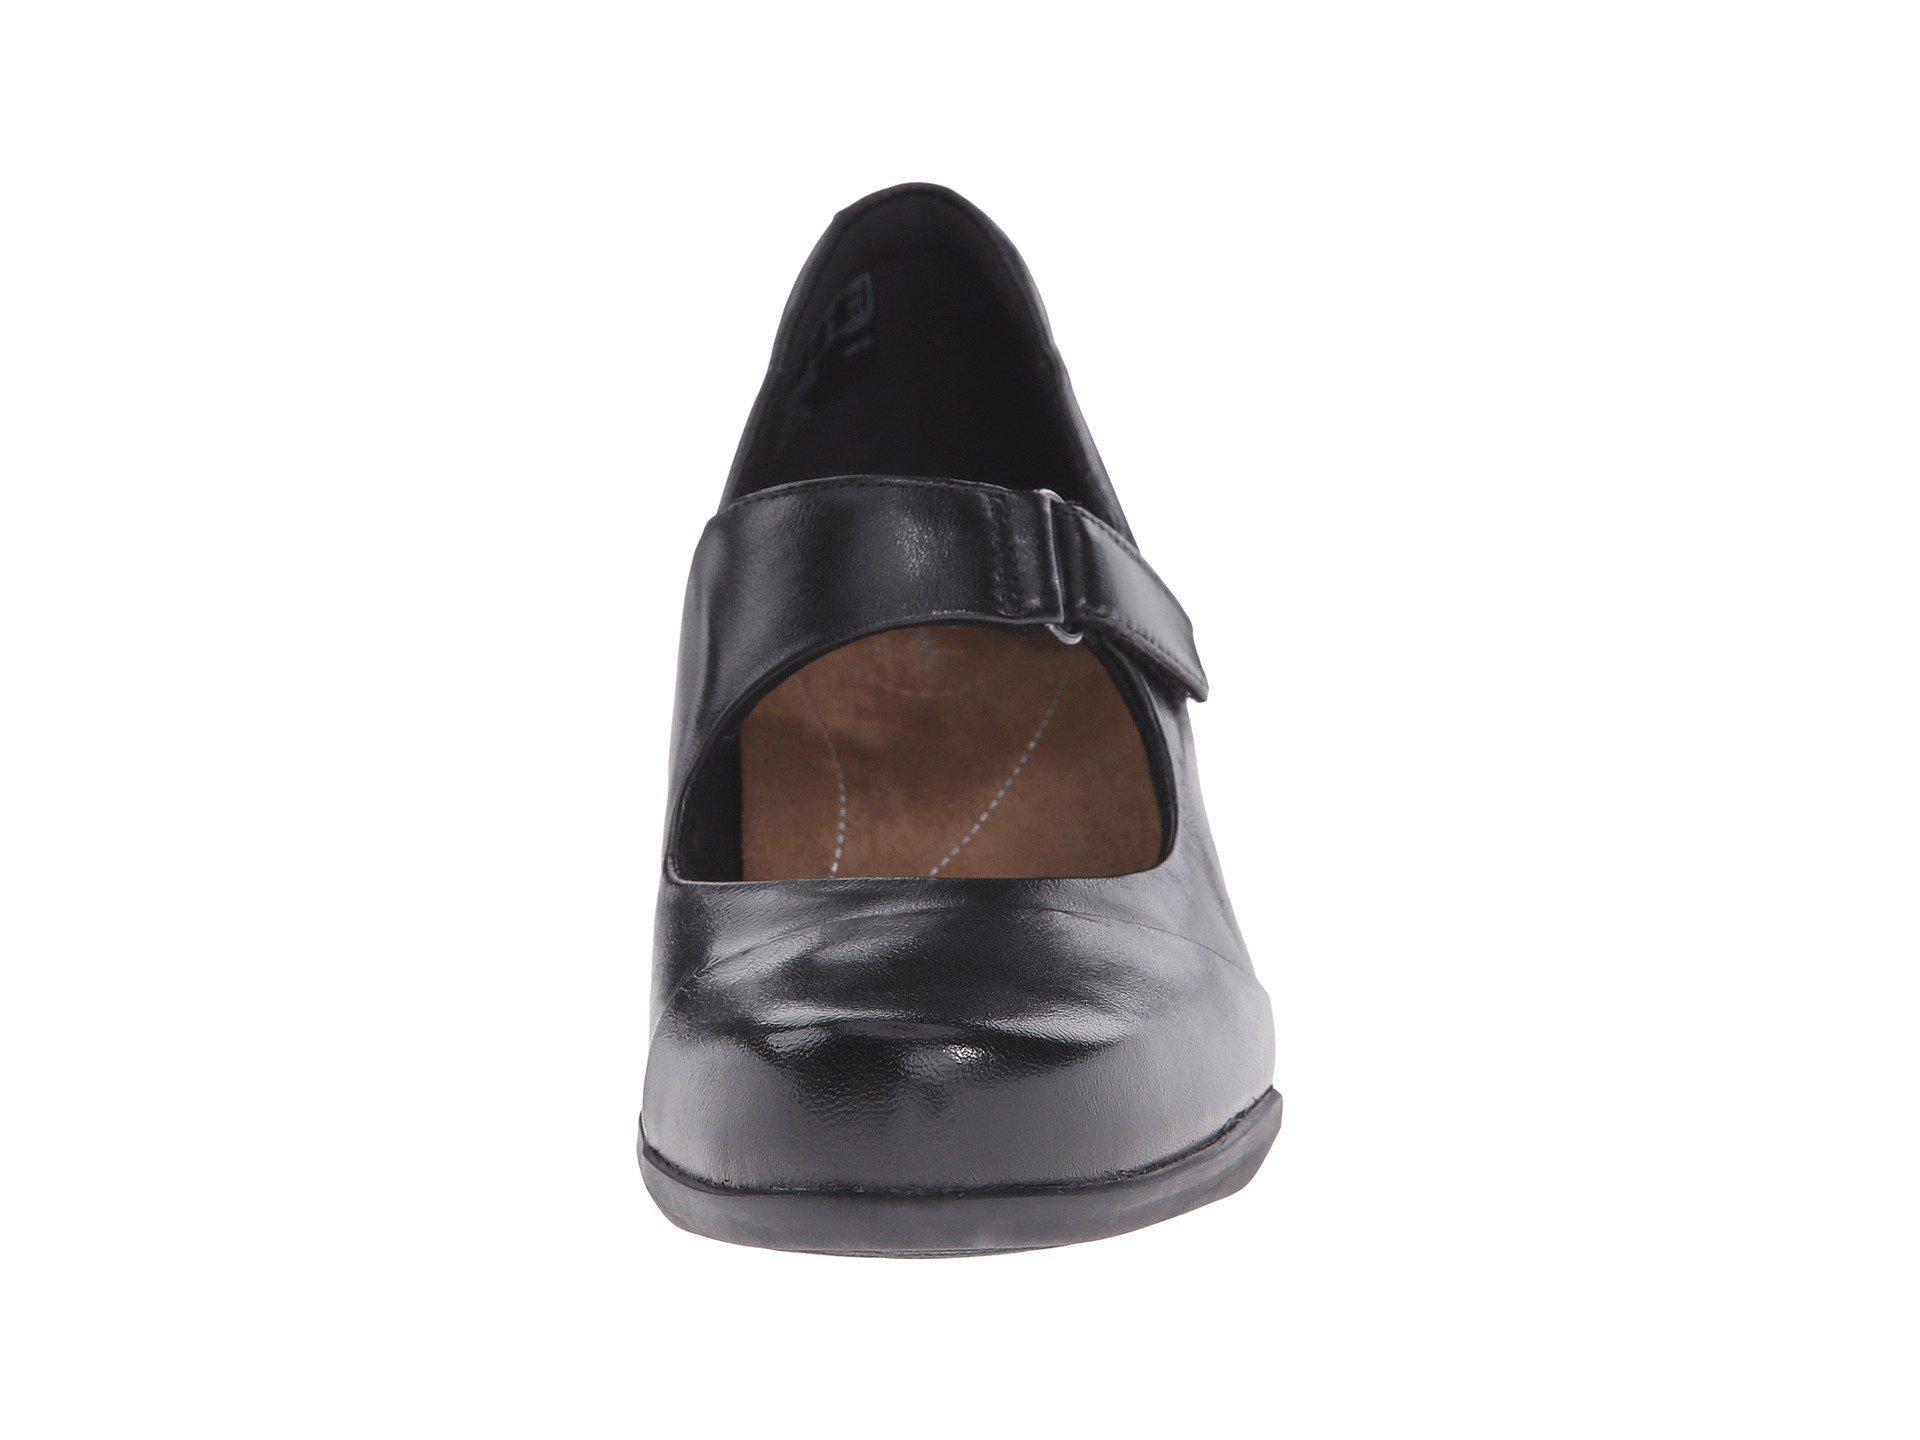 9fa887b61225 Lyst - Clarks Rosalyn Wren (black Leather) High Heels in Black - Save 1%